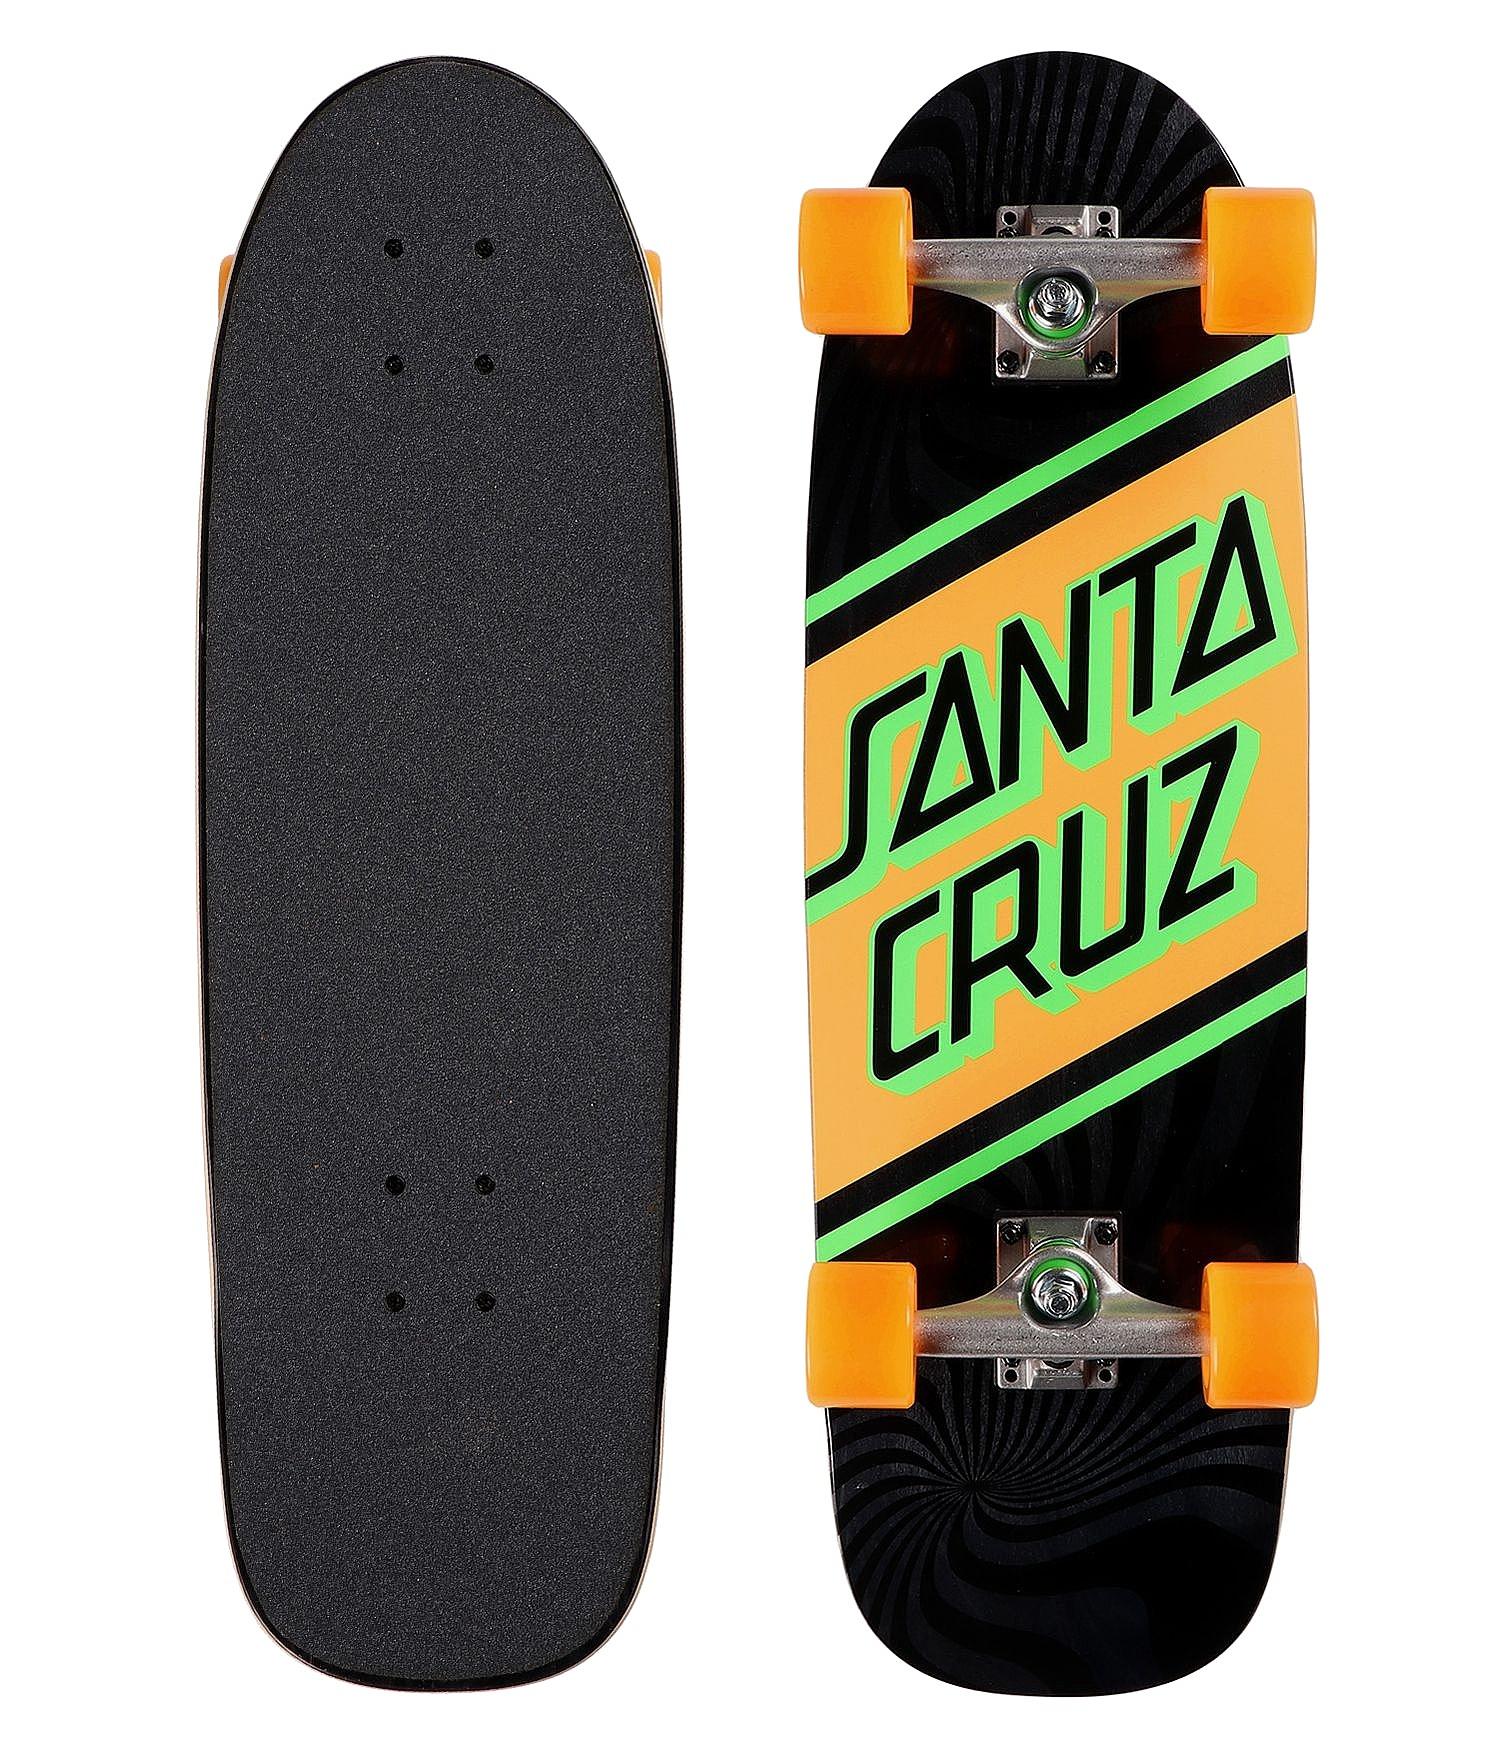 longboard Santa Cruz Street Skate Cruiser - Assorted 8.79x29.05